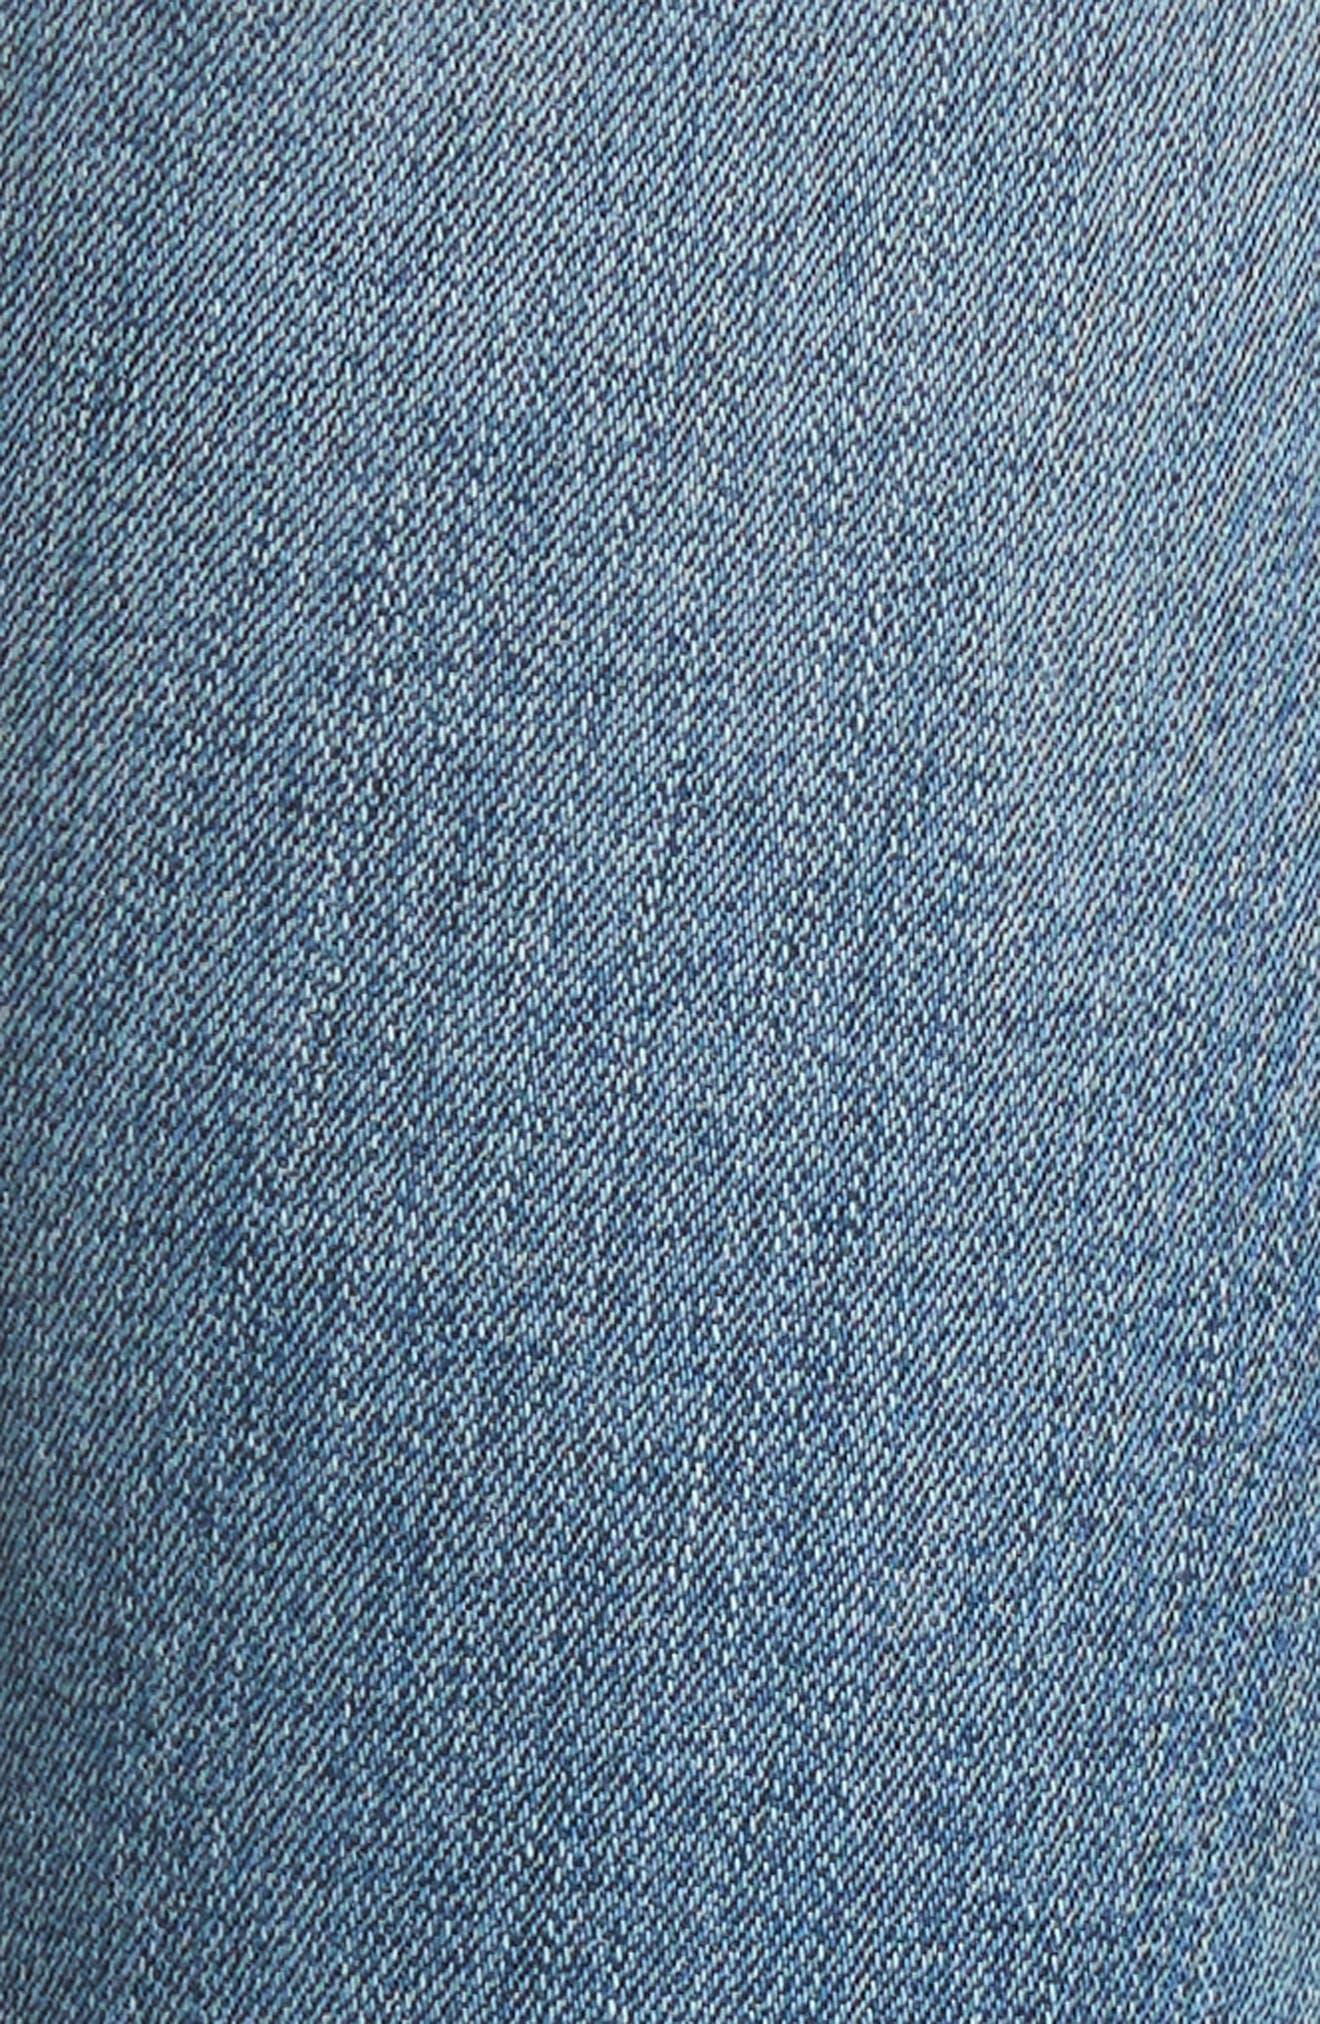 Alternate Image 5  - Hudson Jeans Barbara High Waist Ankle Skinny Jeans (Confection)